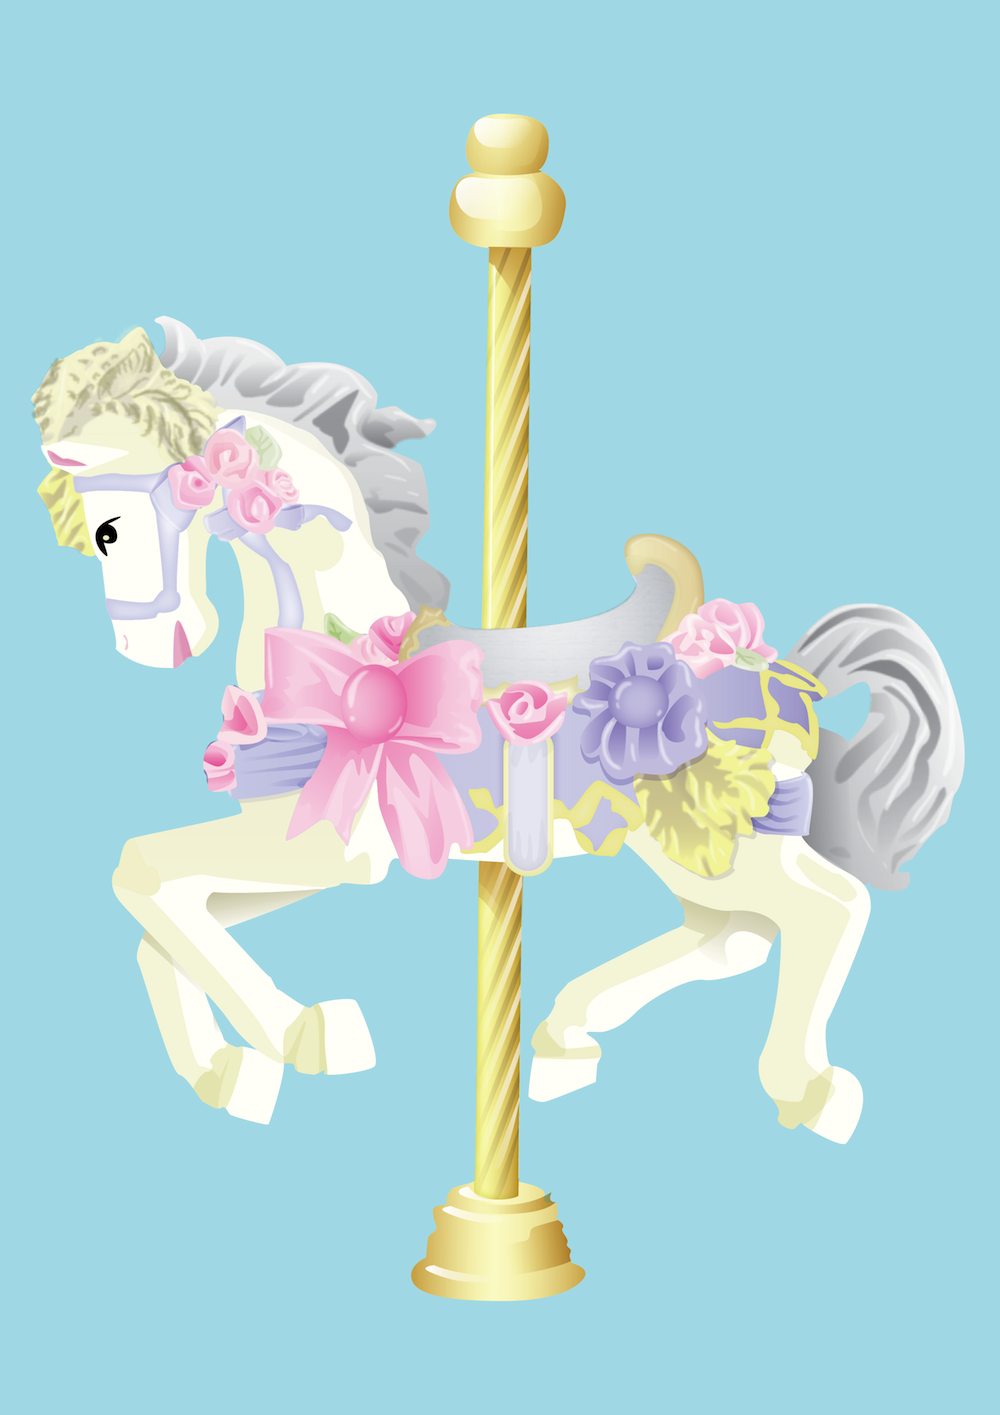 Cute Carousel Horse Illustration - Carousel Horse PNG HD